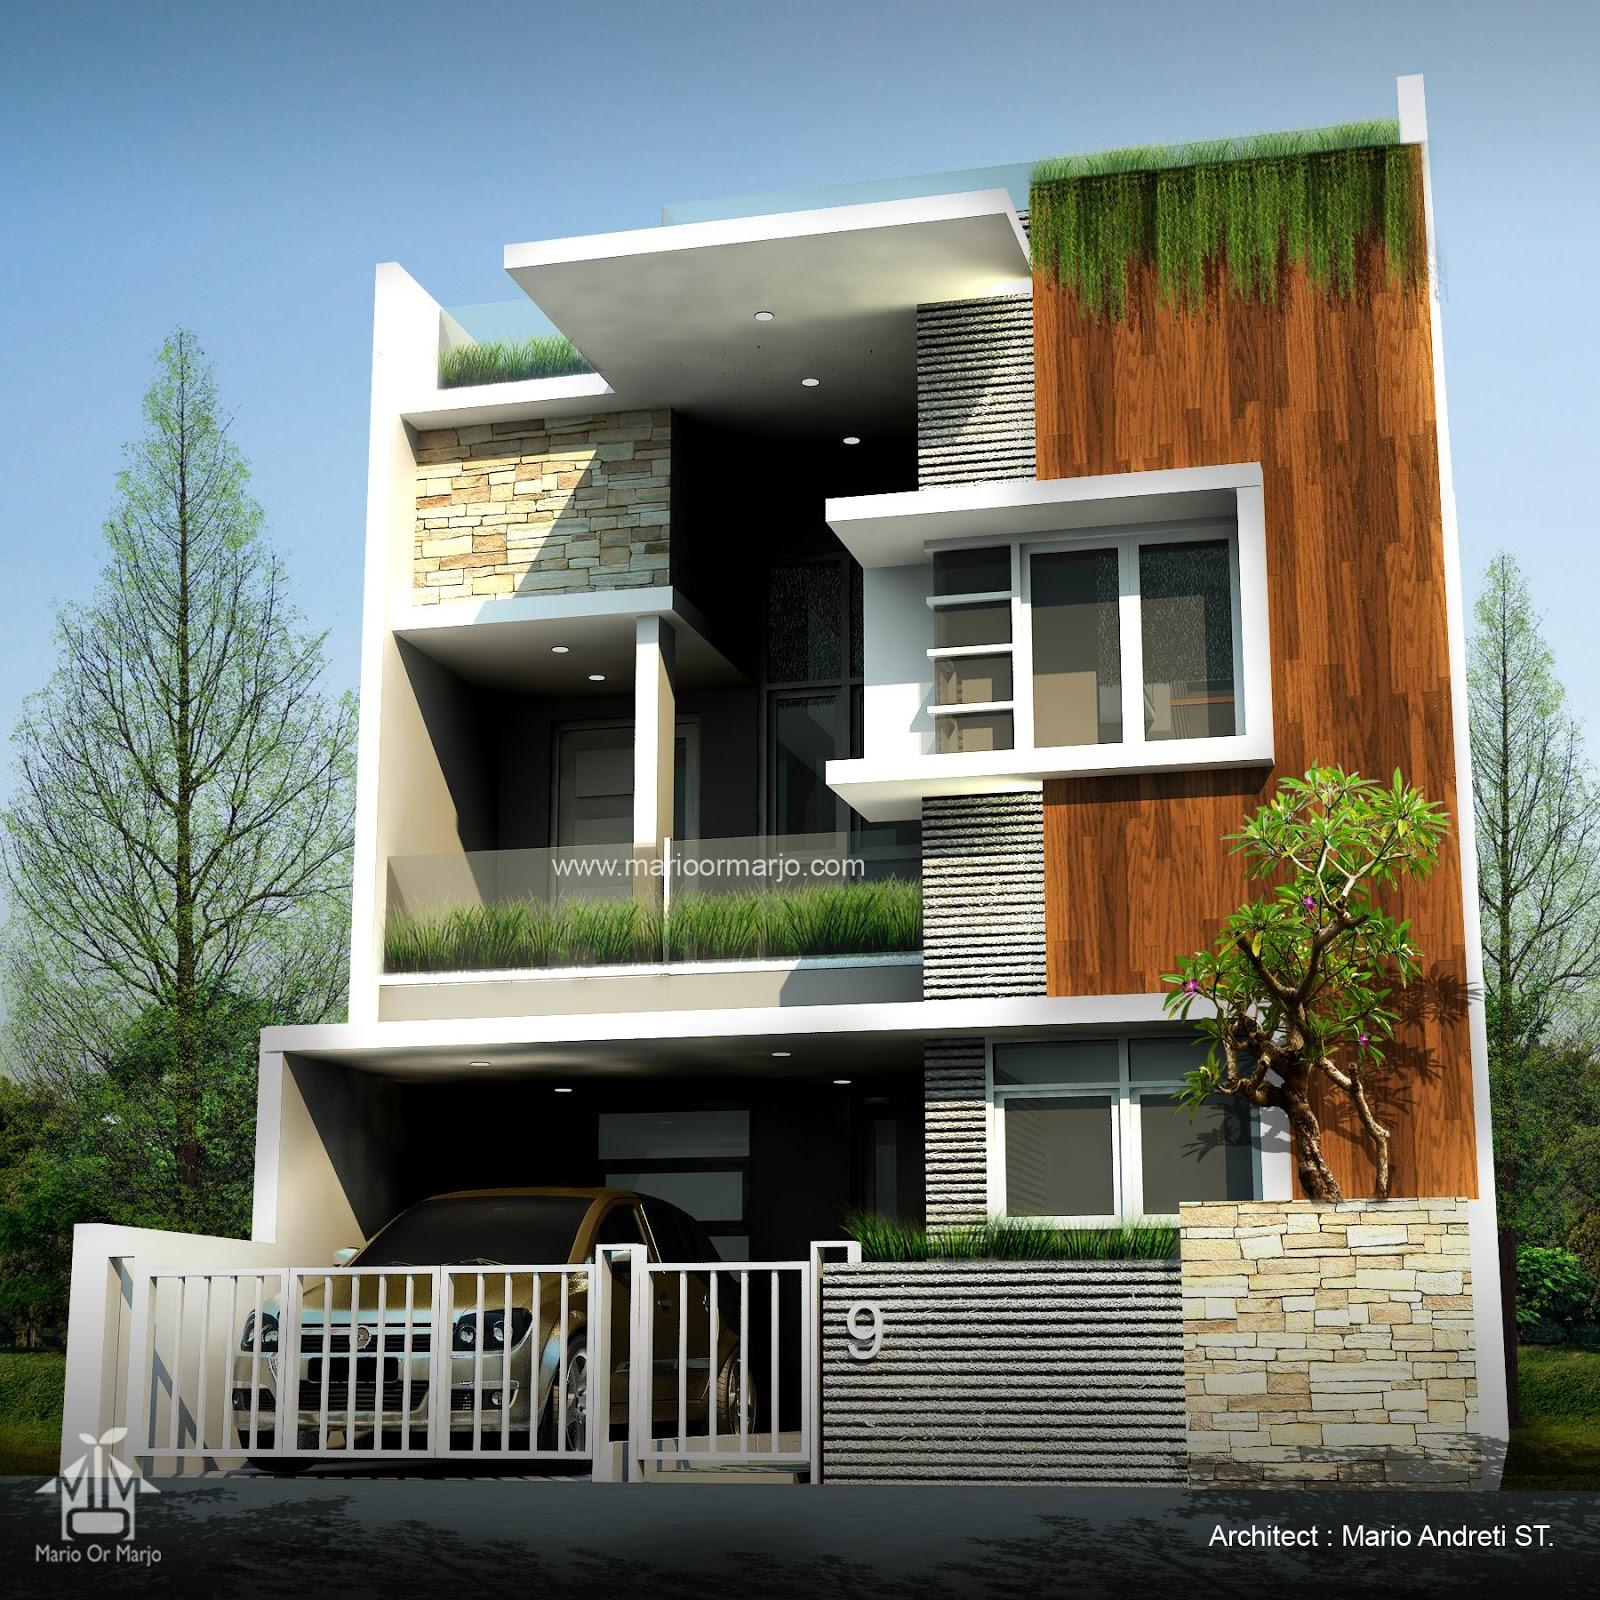 Desain Rumah Minimalis Semi Basement | Kumpulan Desain Rumah